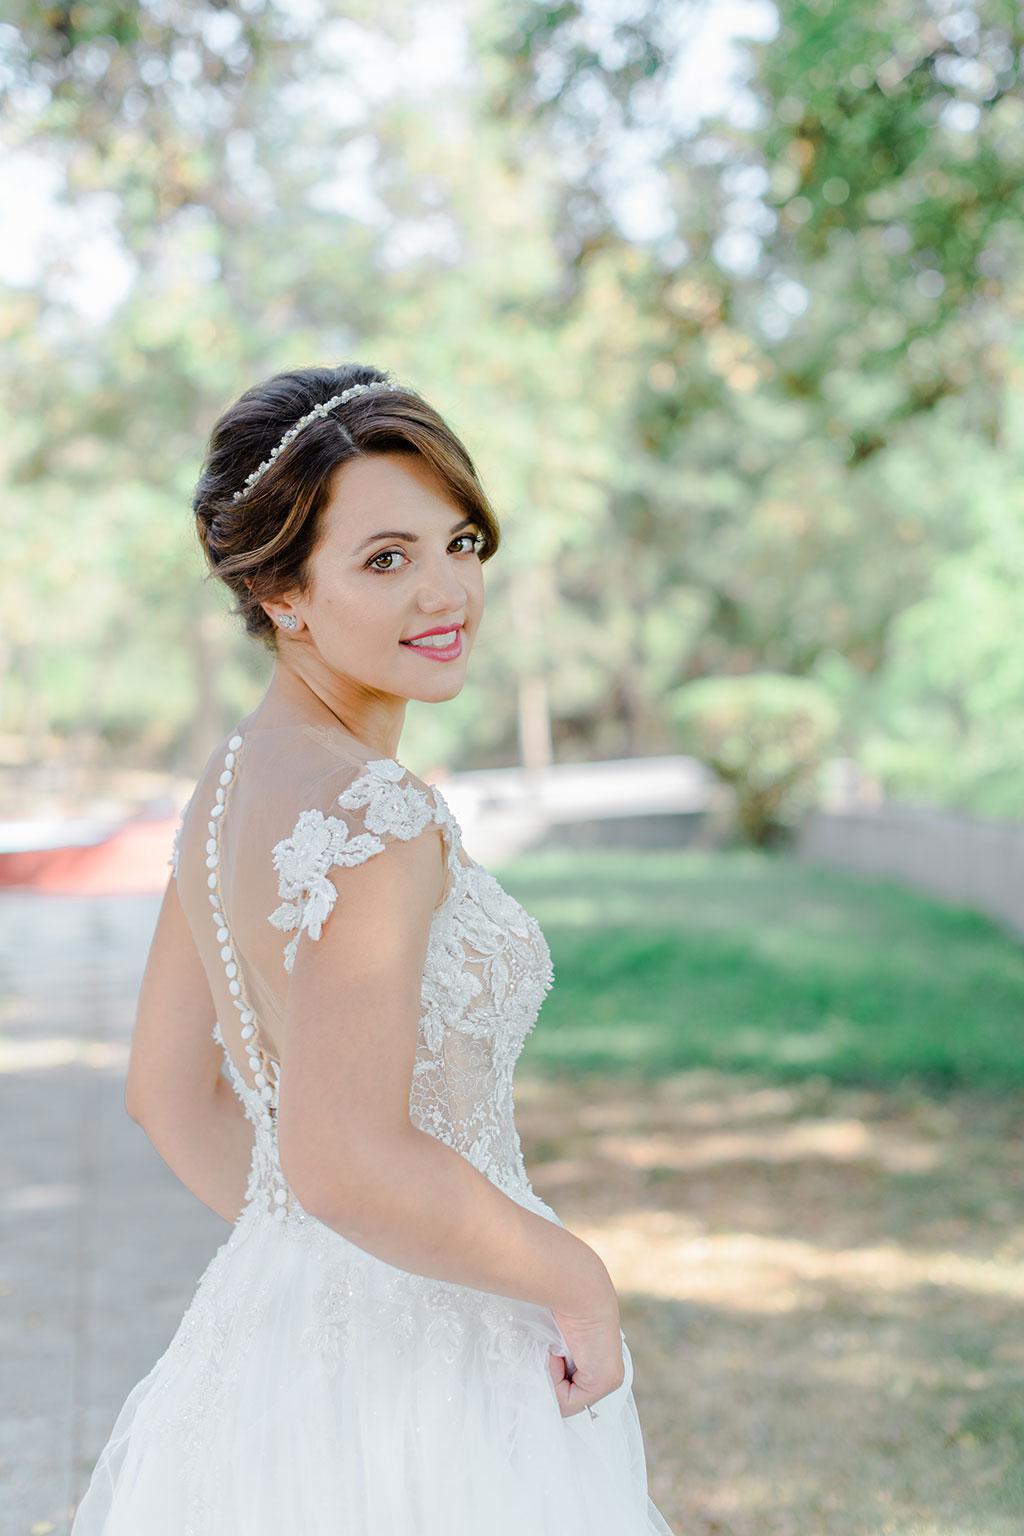 Happy sweet bride at her photoshhot, Υπέροχο νυφικό πορτραίτο στην Θεσσαλονίκη